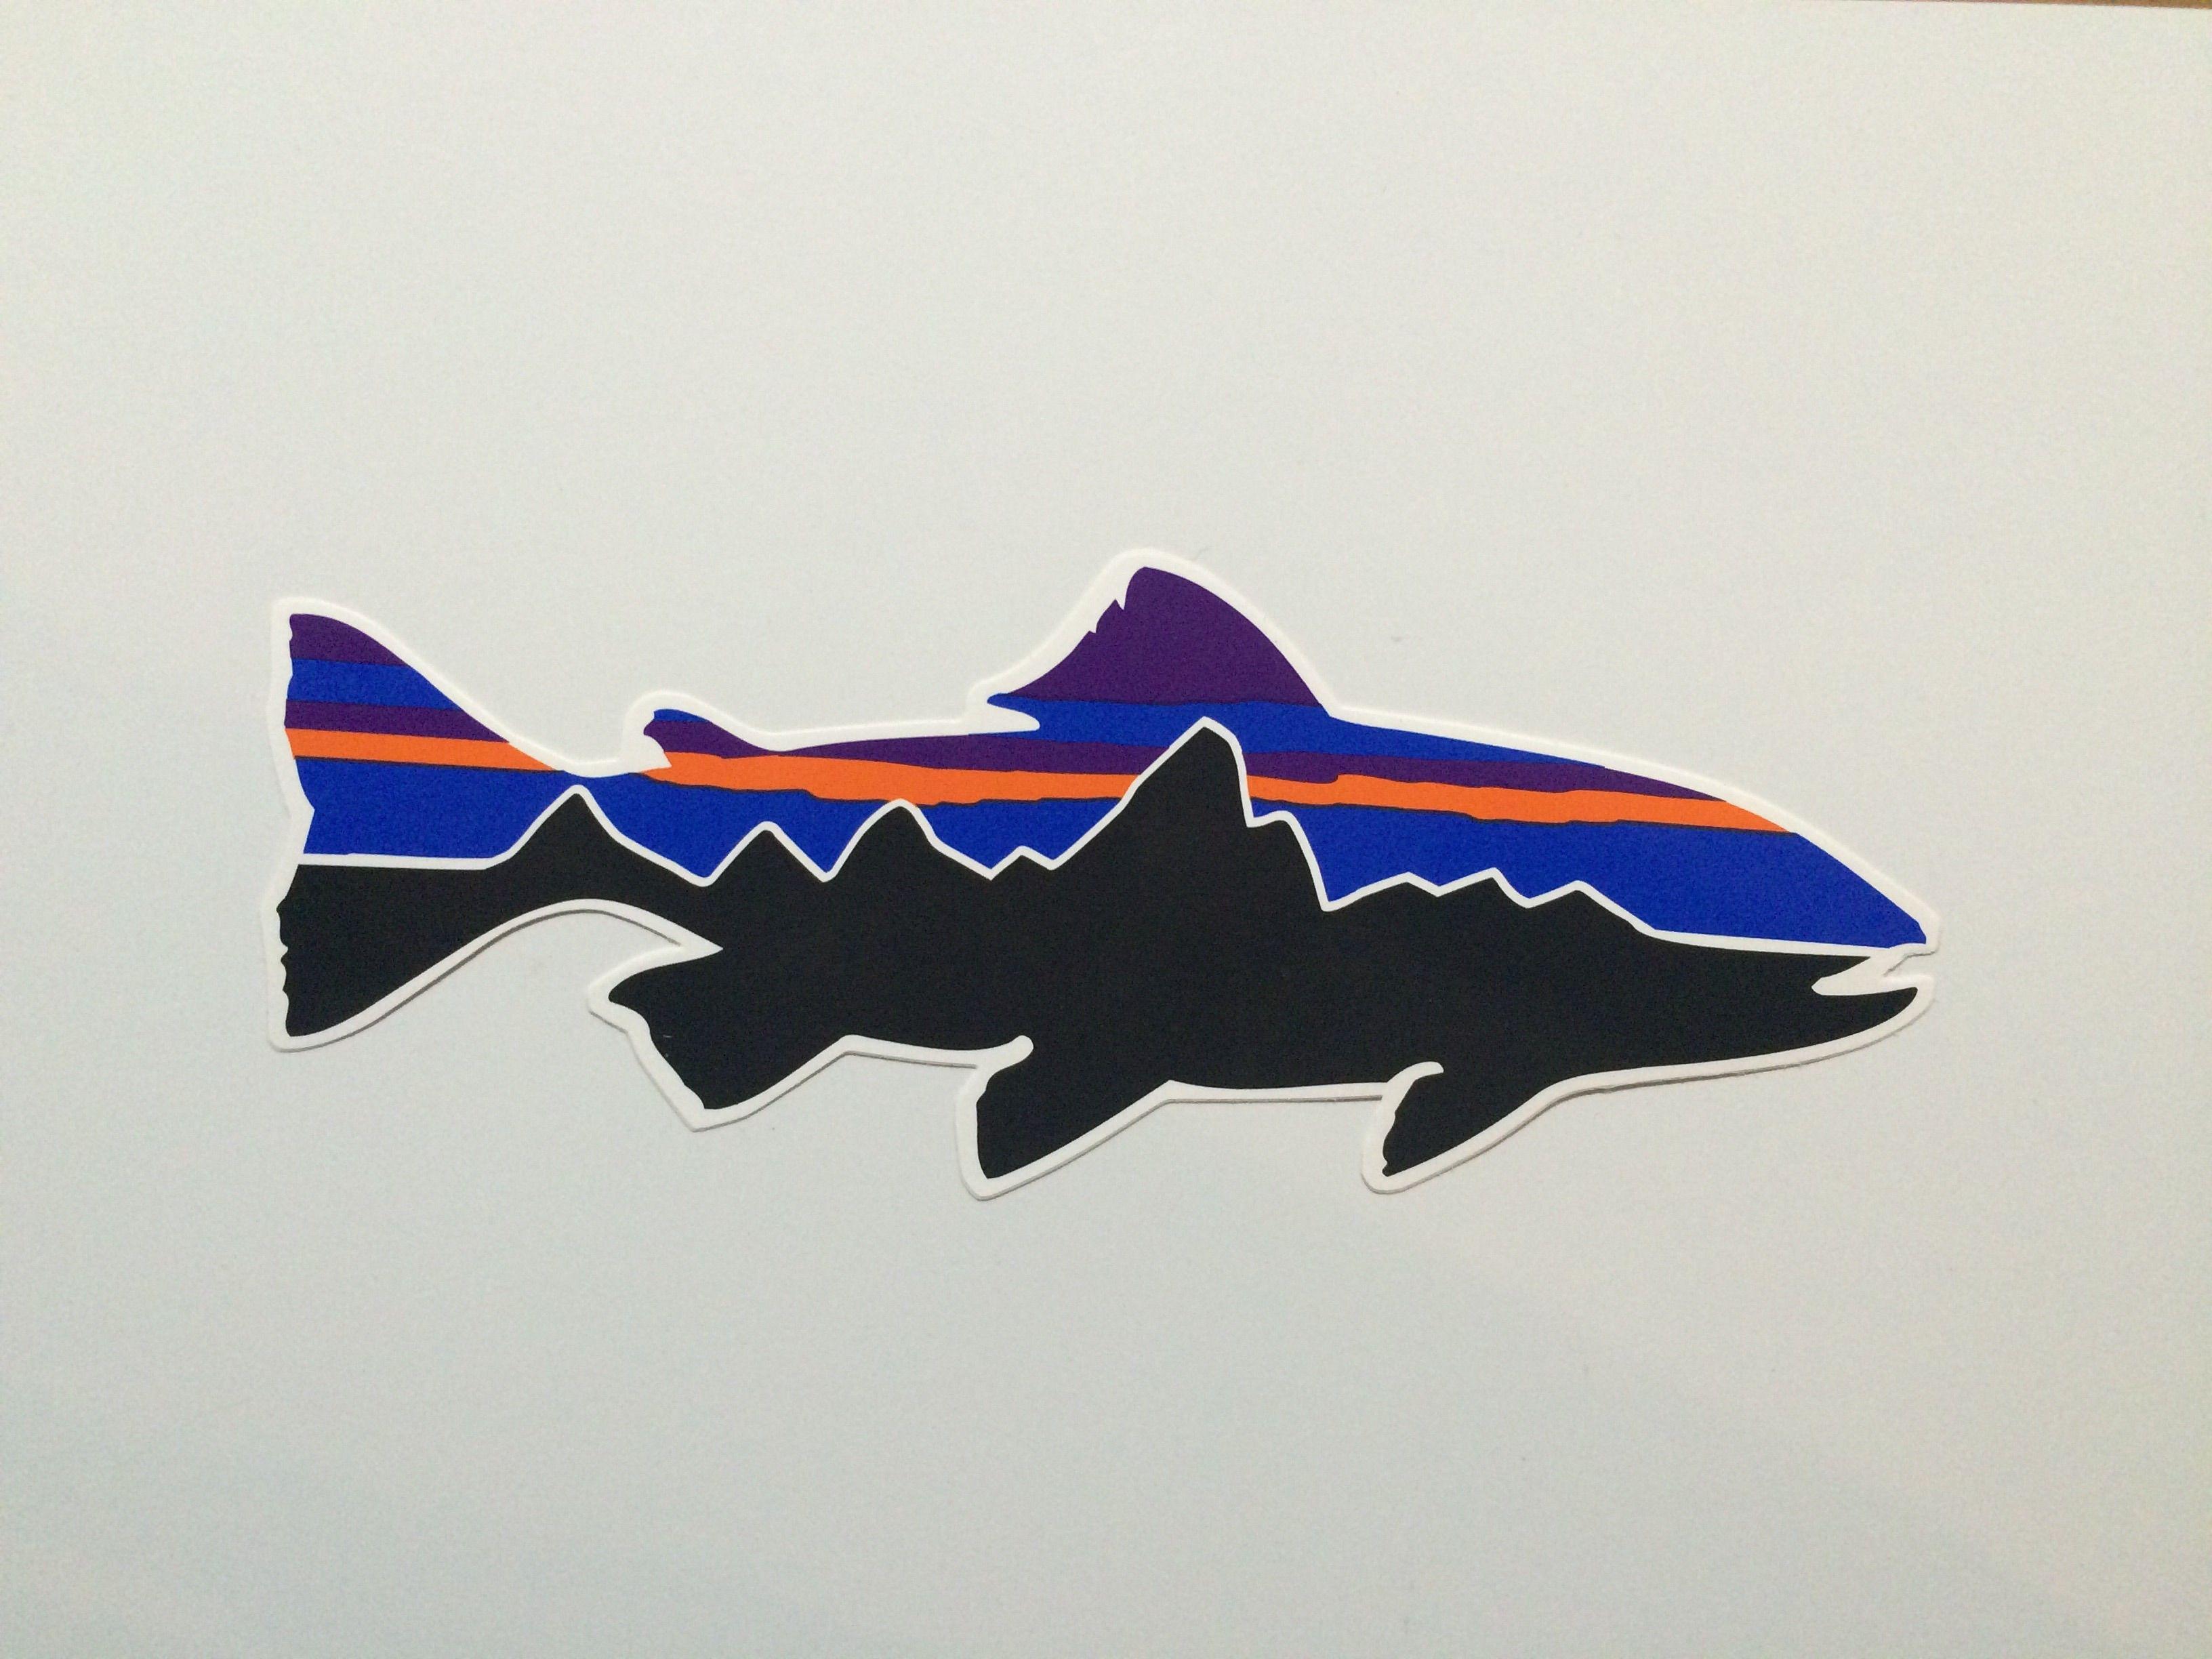 patagonia トラウトフィッツロイ ステッカー